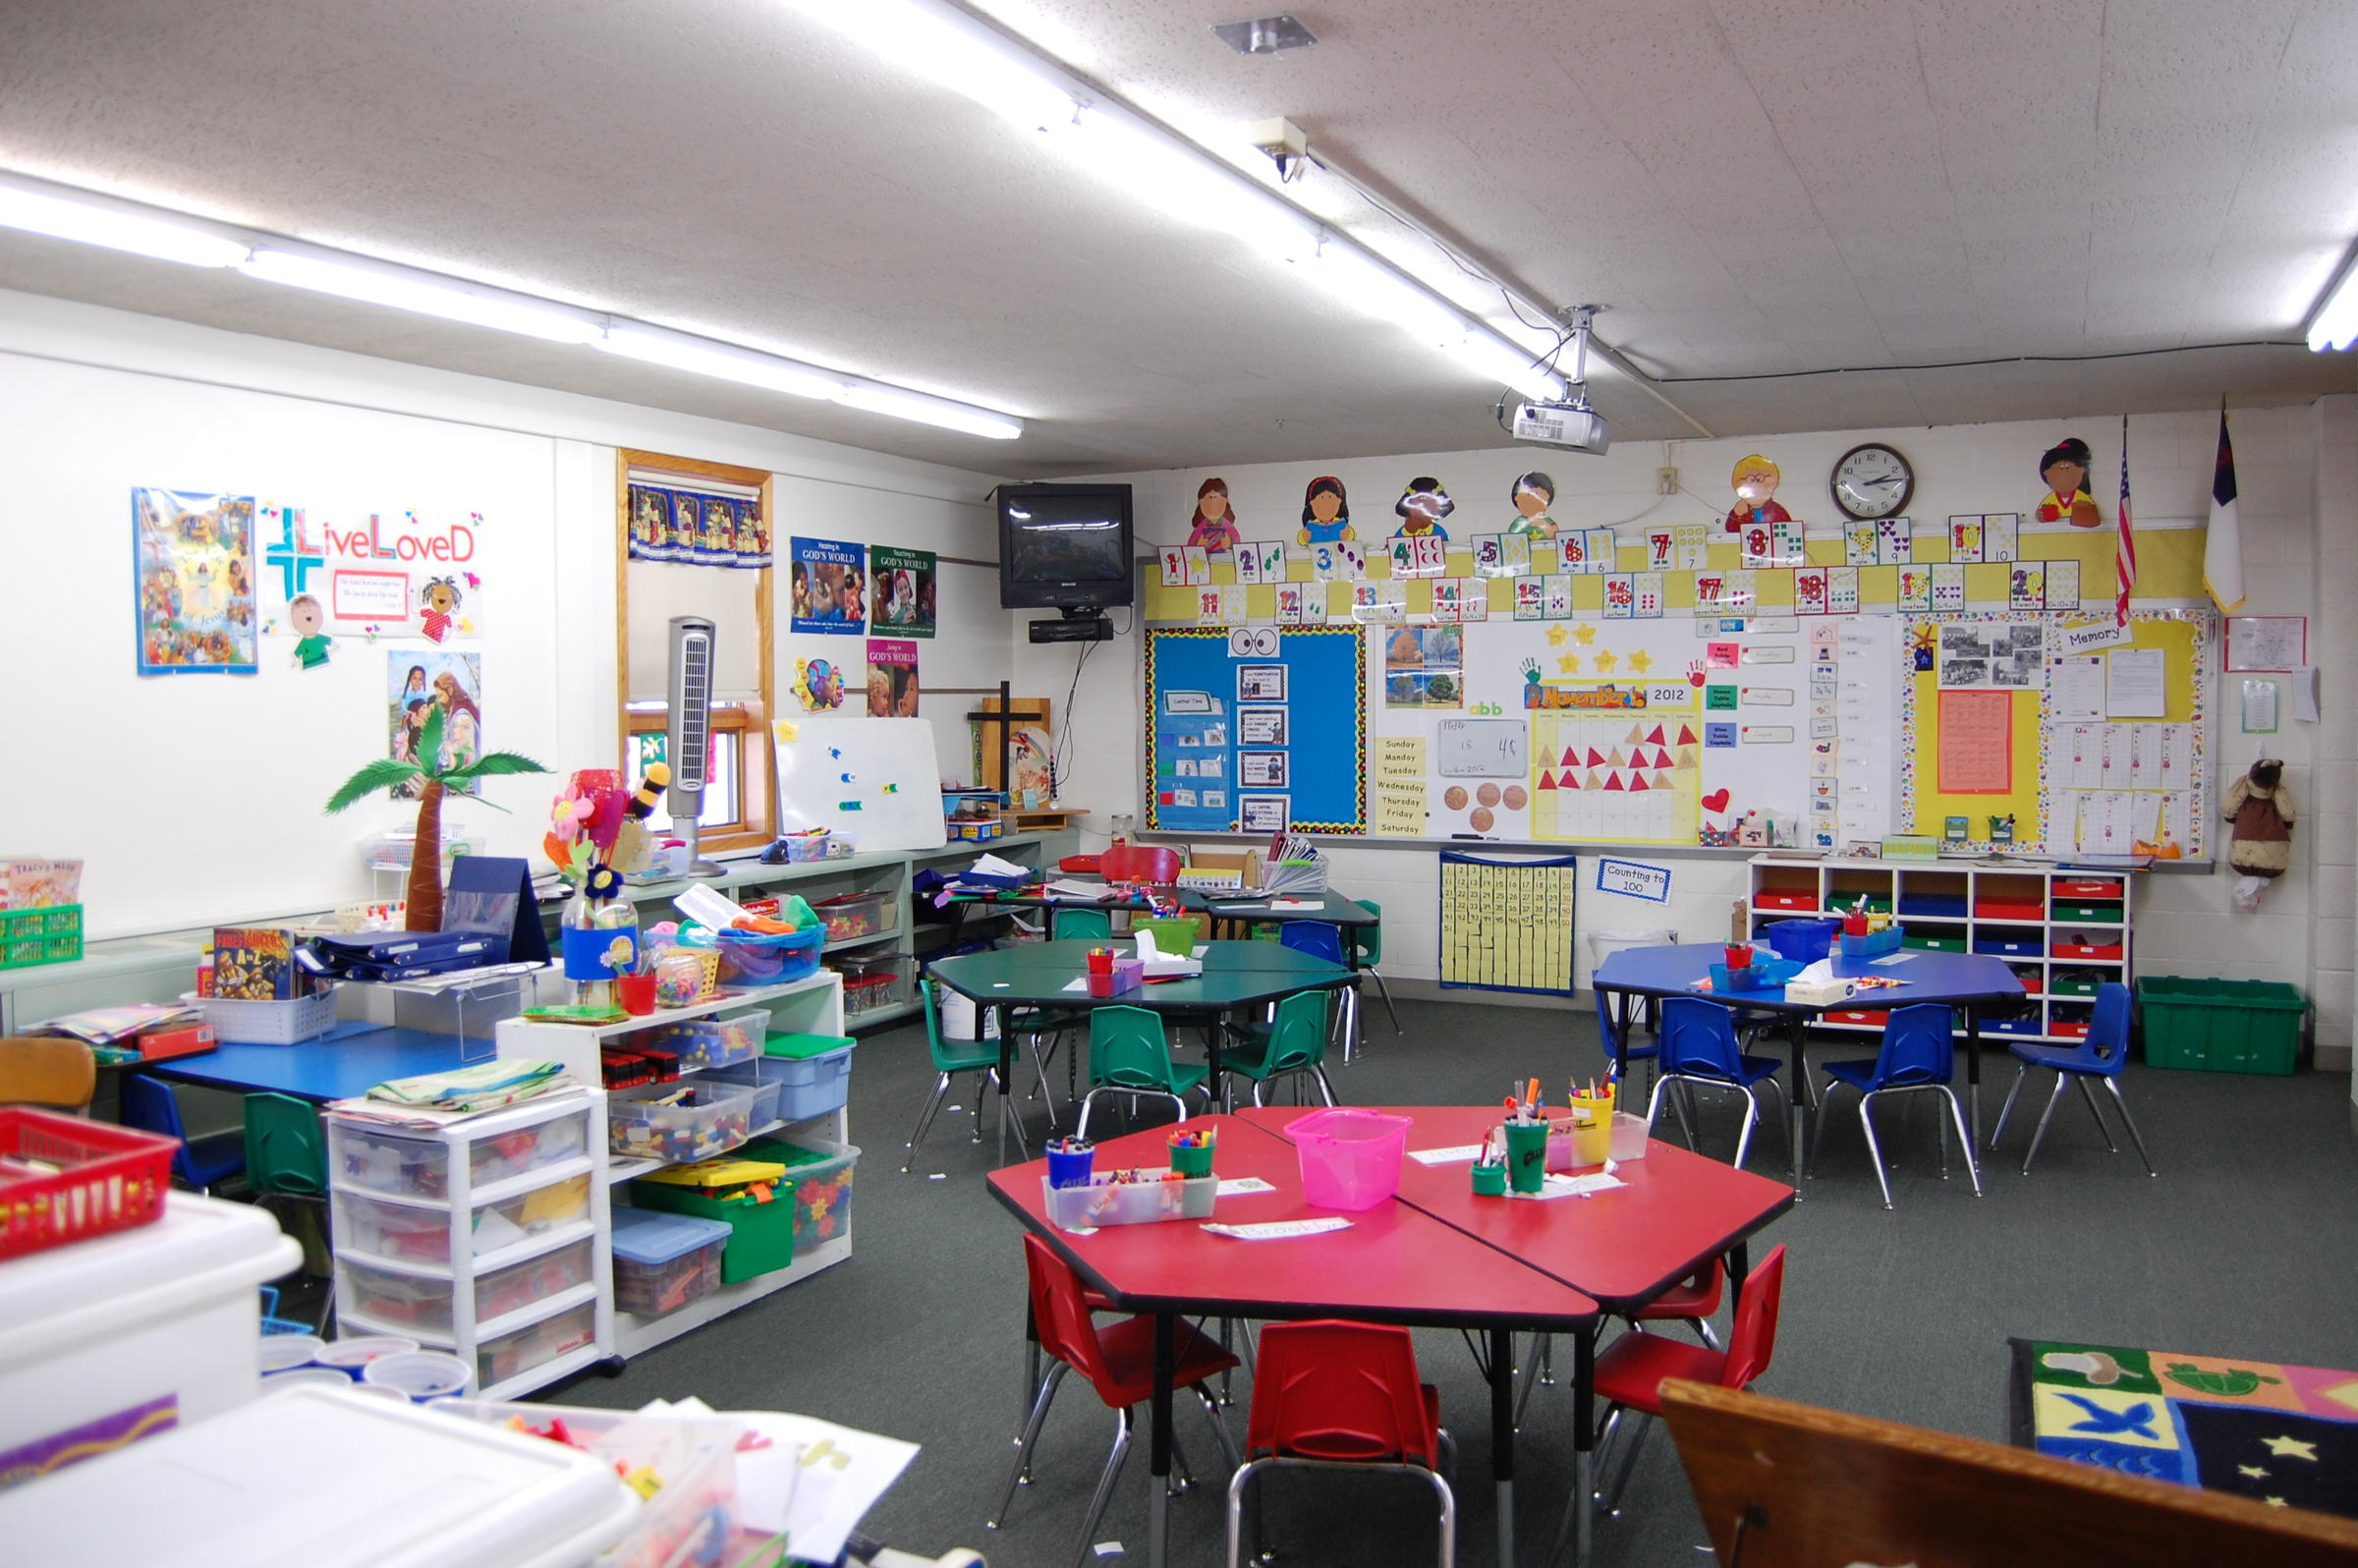 Classroom Environment Design : Finding utah s at risk kindergarteners upr public radio